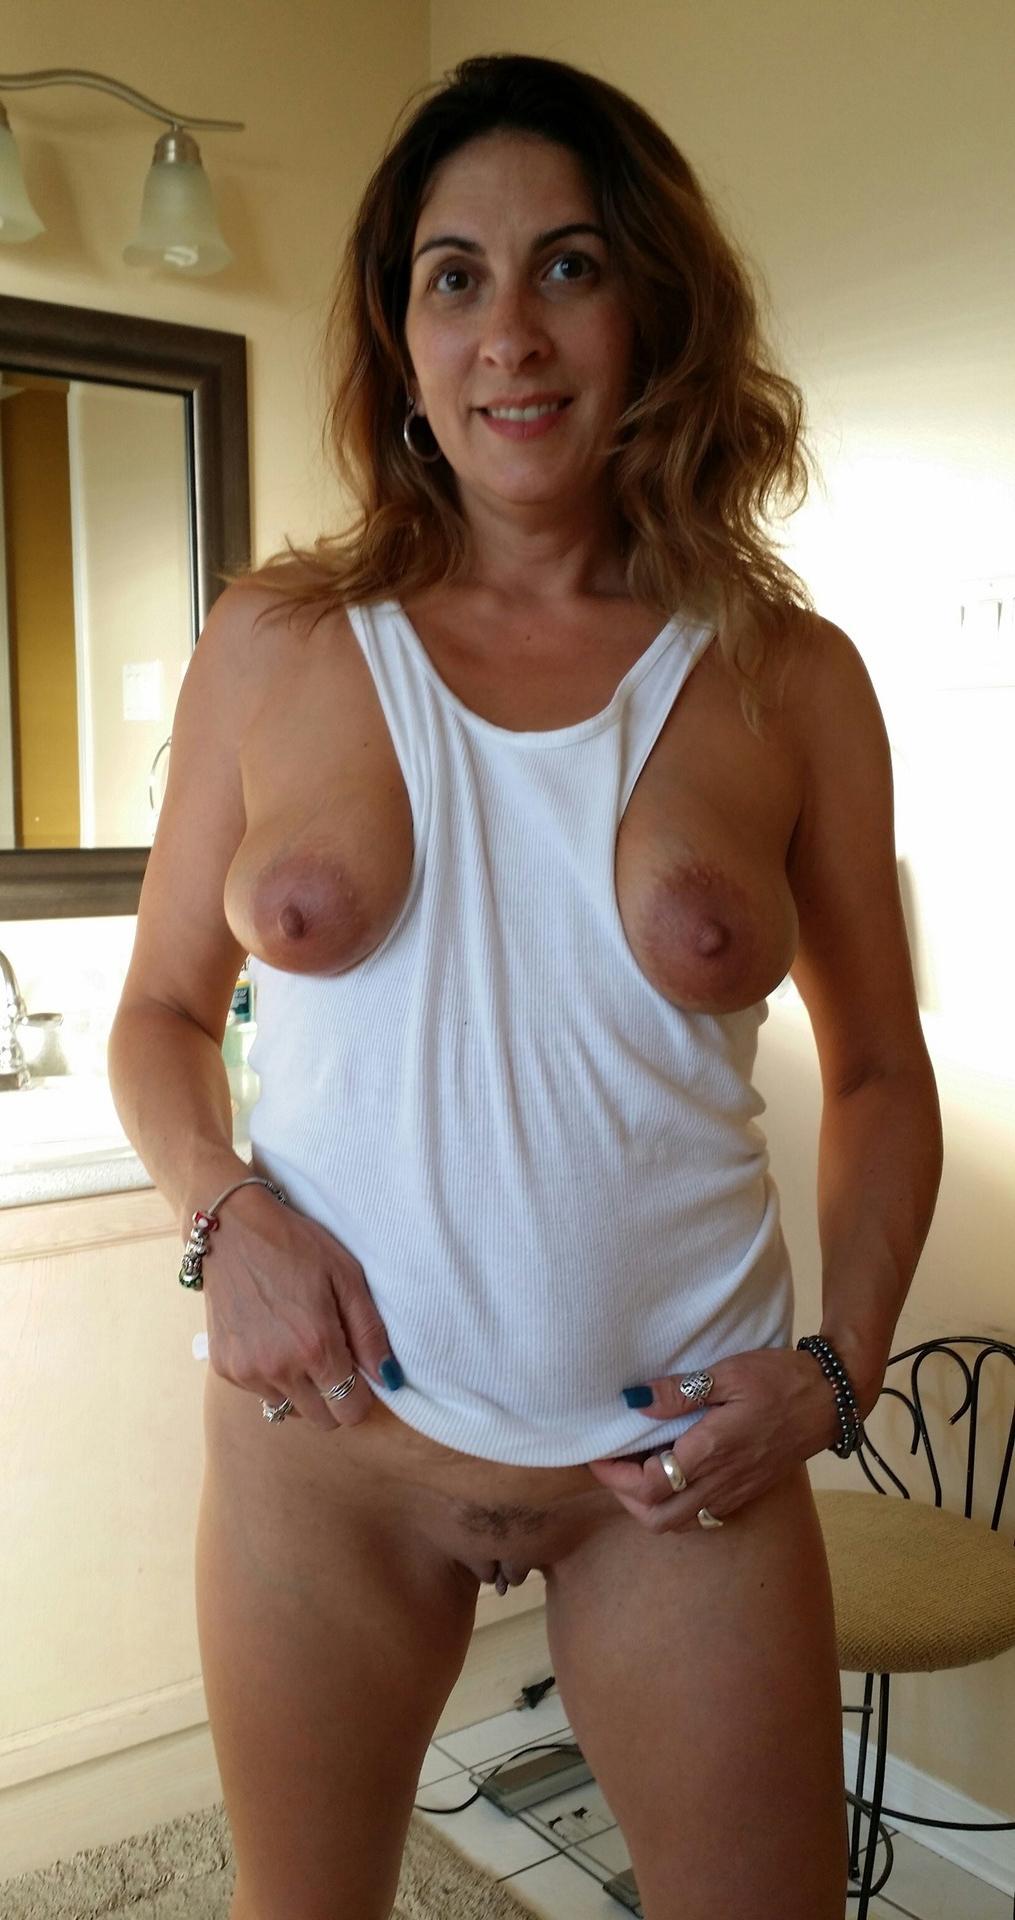 Mature milf nude pics